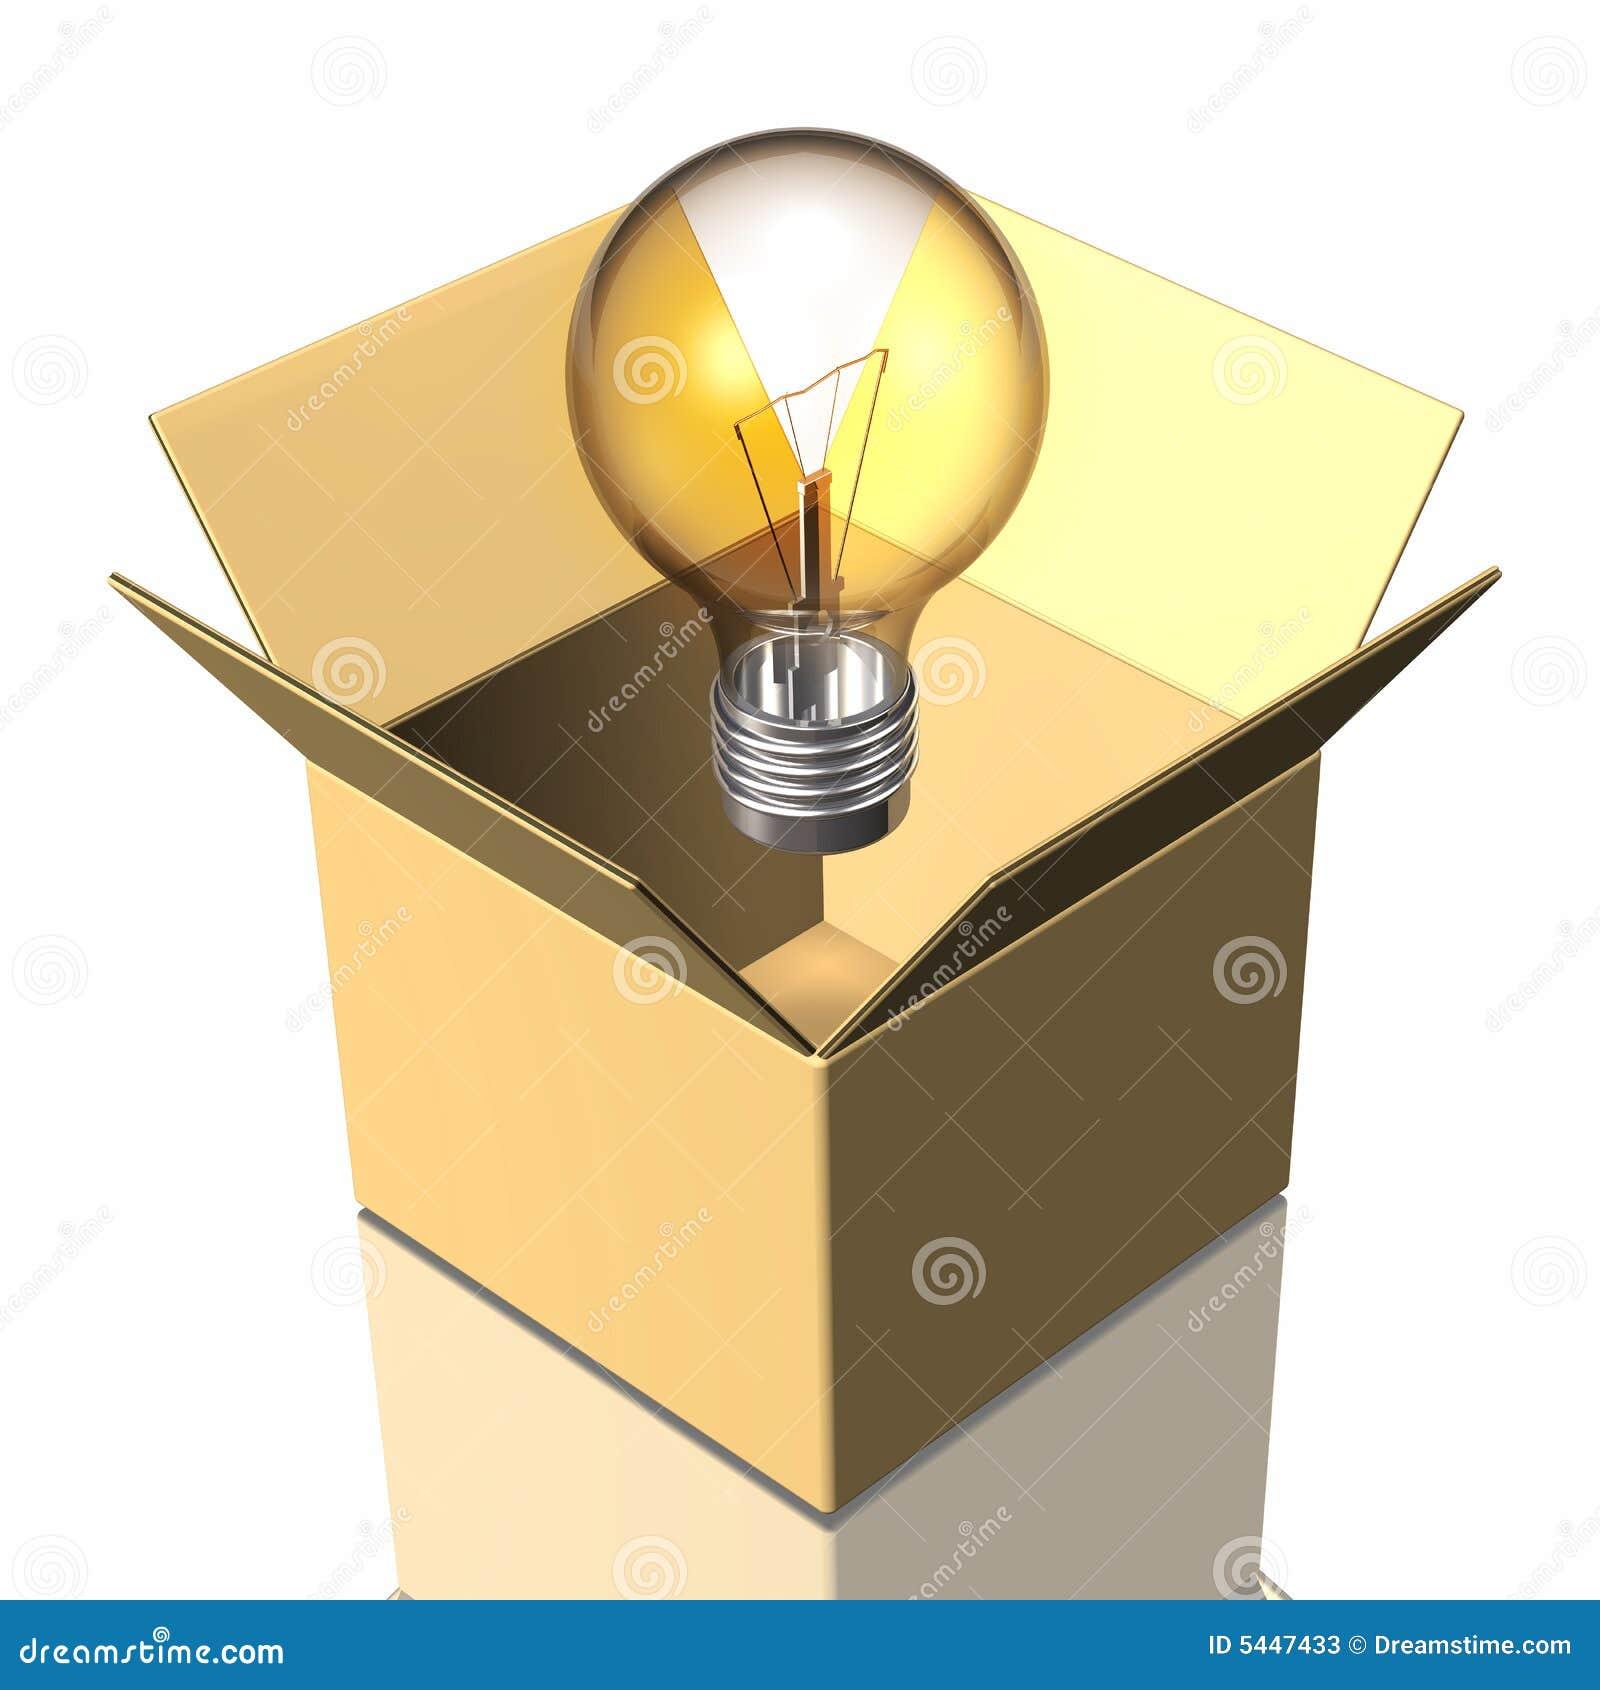 box and light bulb stock photos image 5447433. Black Bedroom Furniture Sets. Home Design Ideas